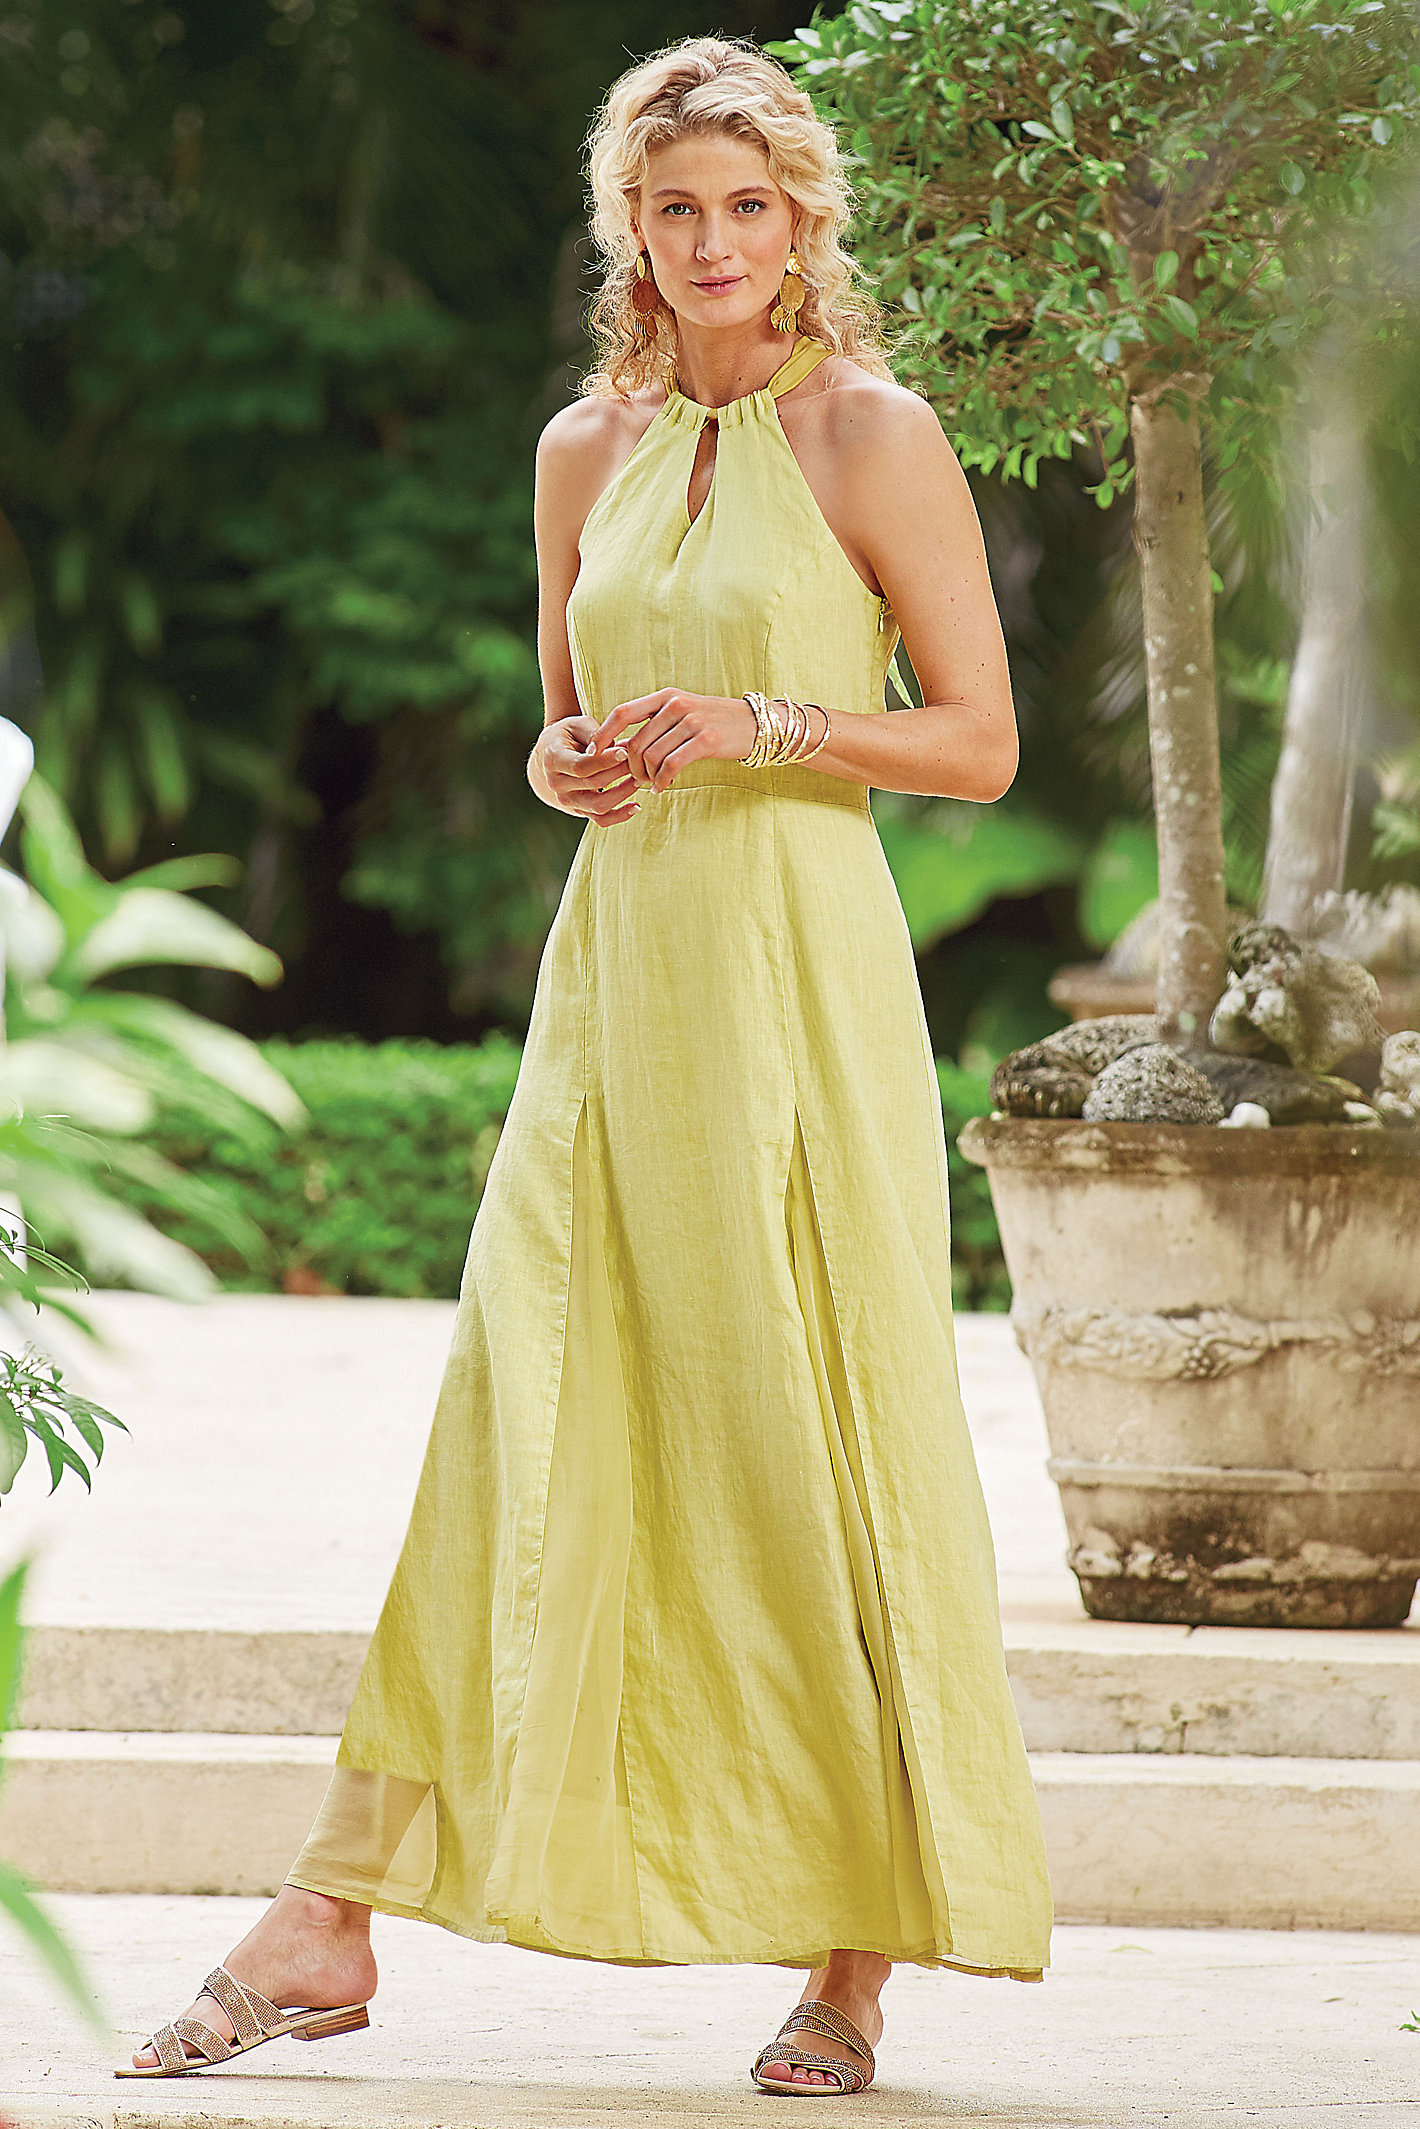 Allegory Linen Dress